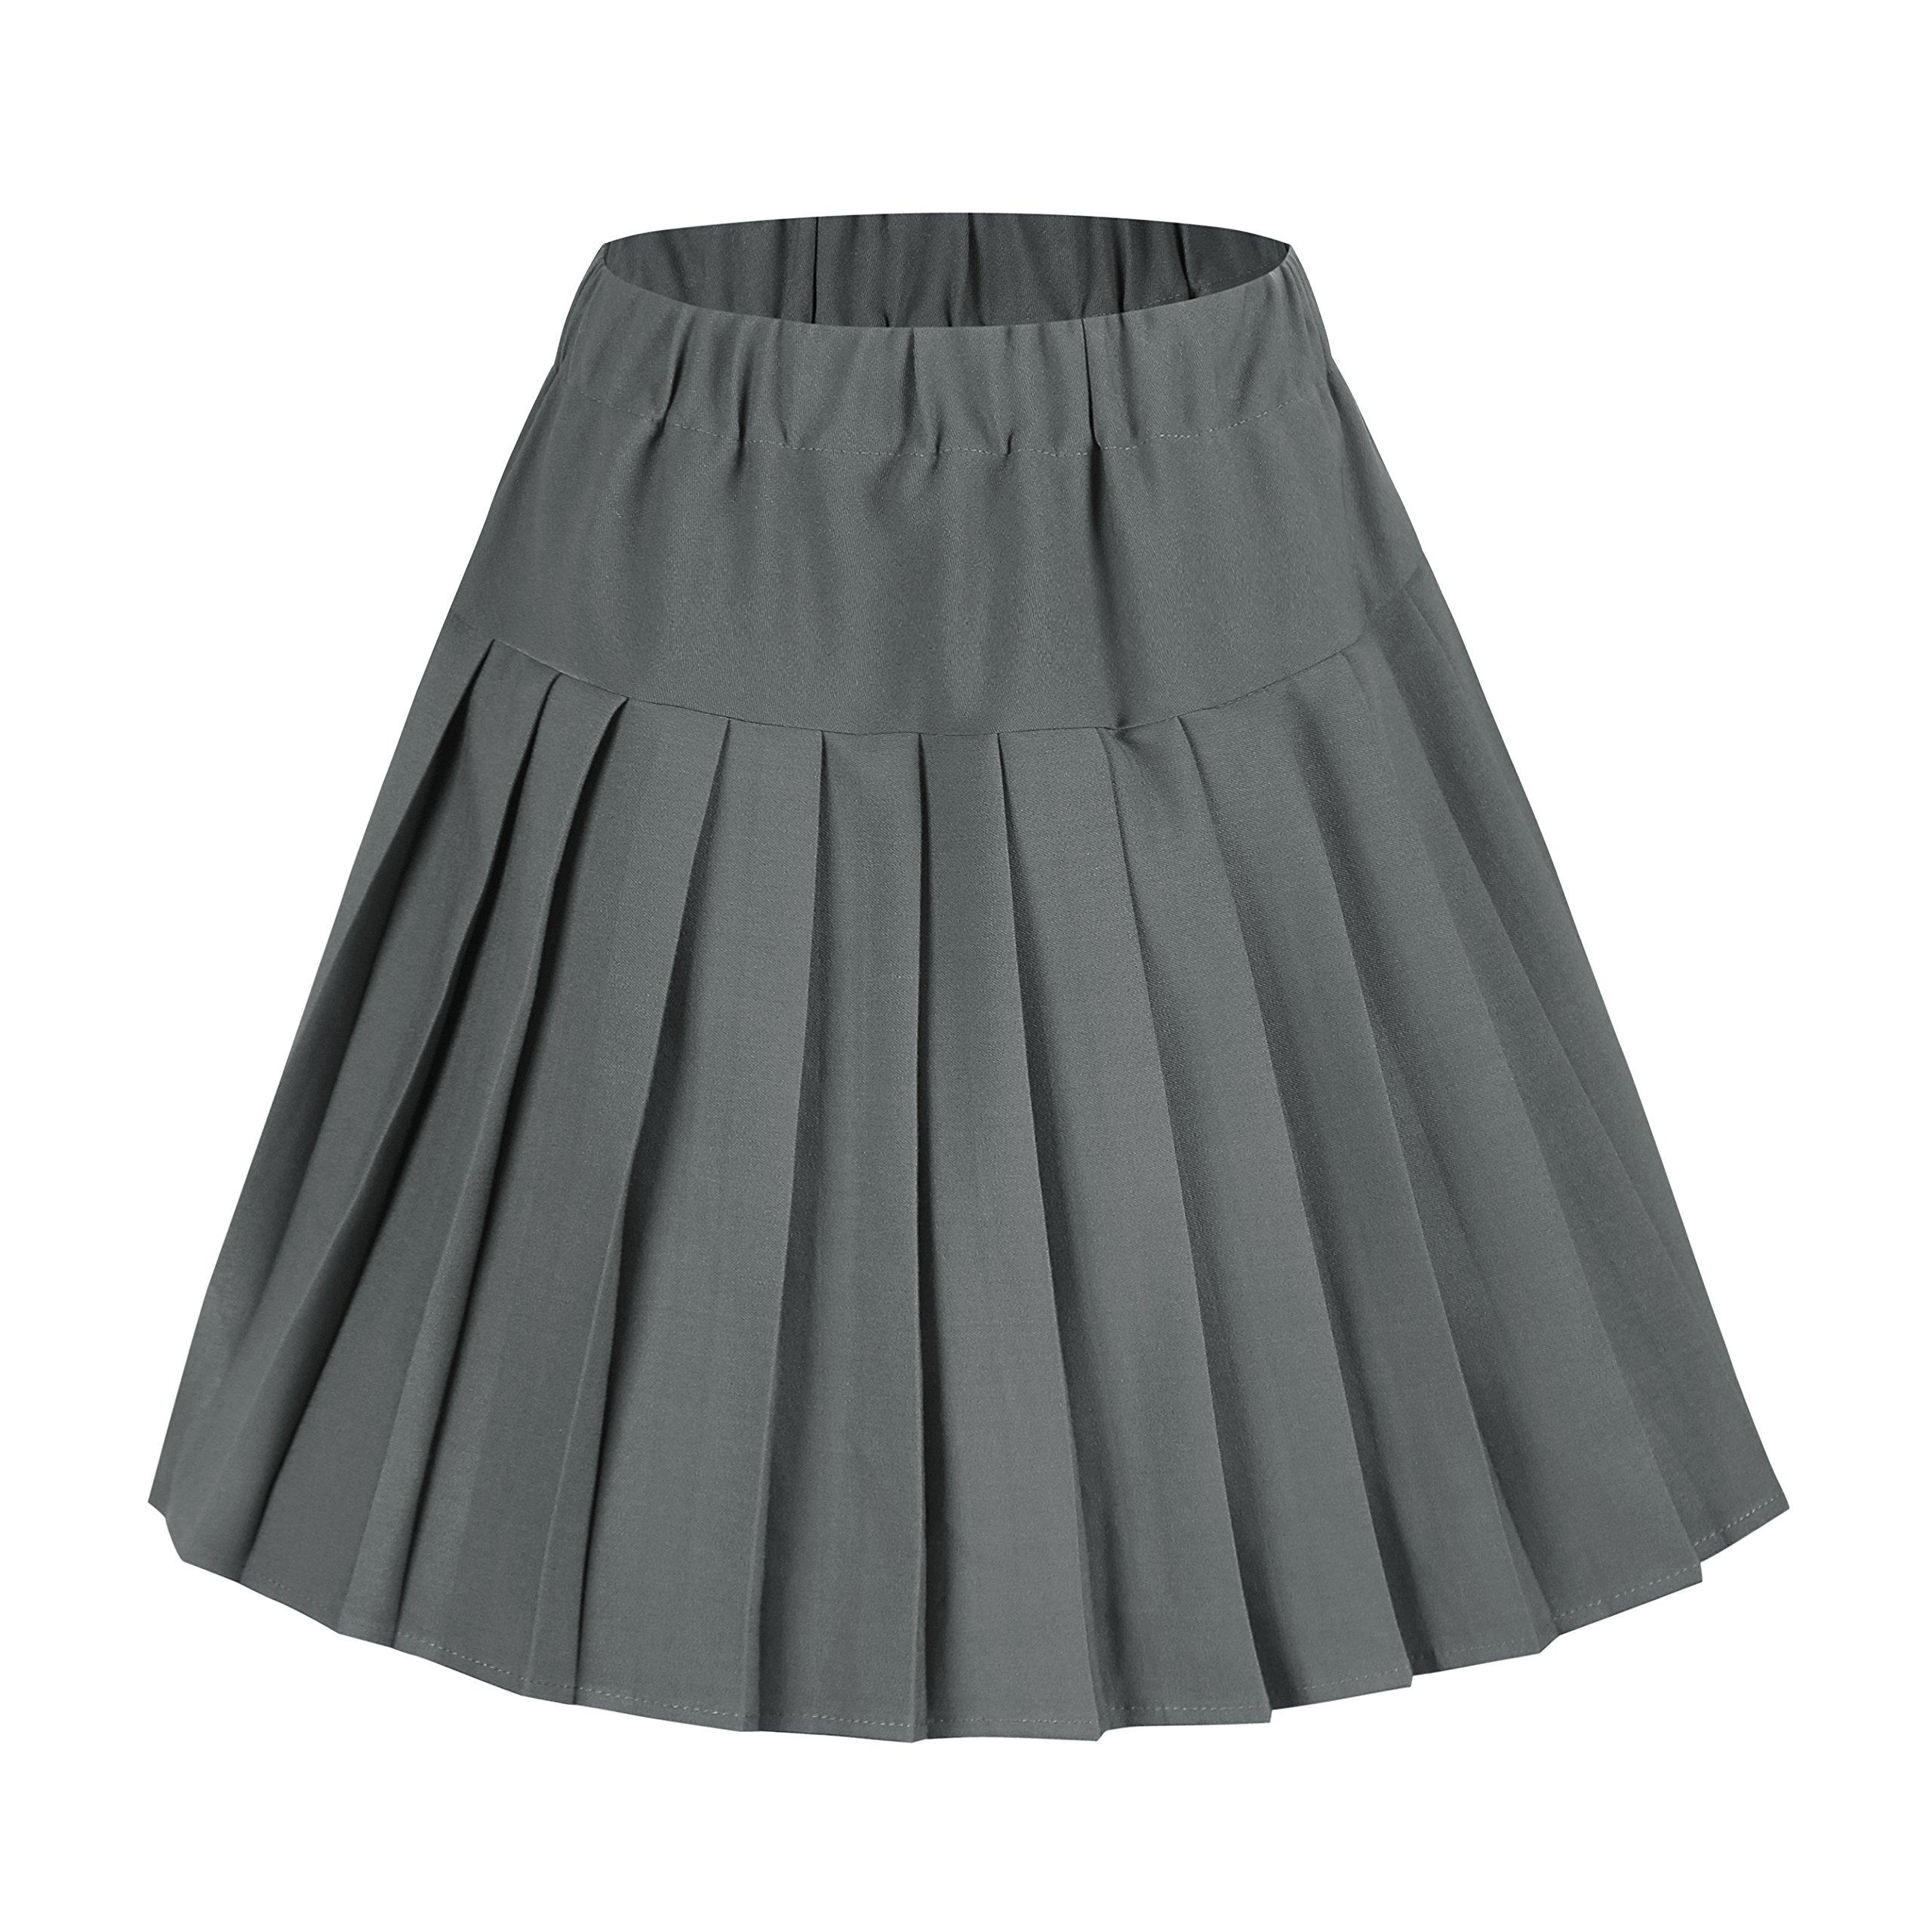 Urban CoCo Women's Elastic Waist Tartan Pleated School Skirt (Solid Grey, Medium)